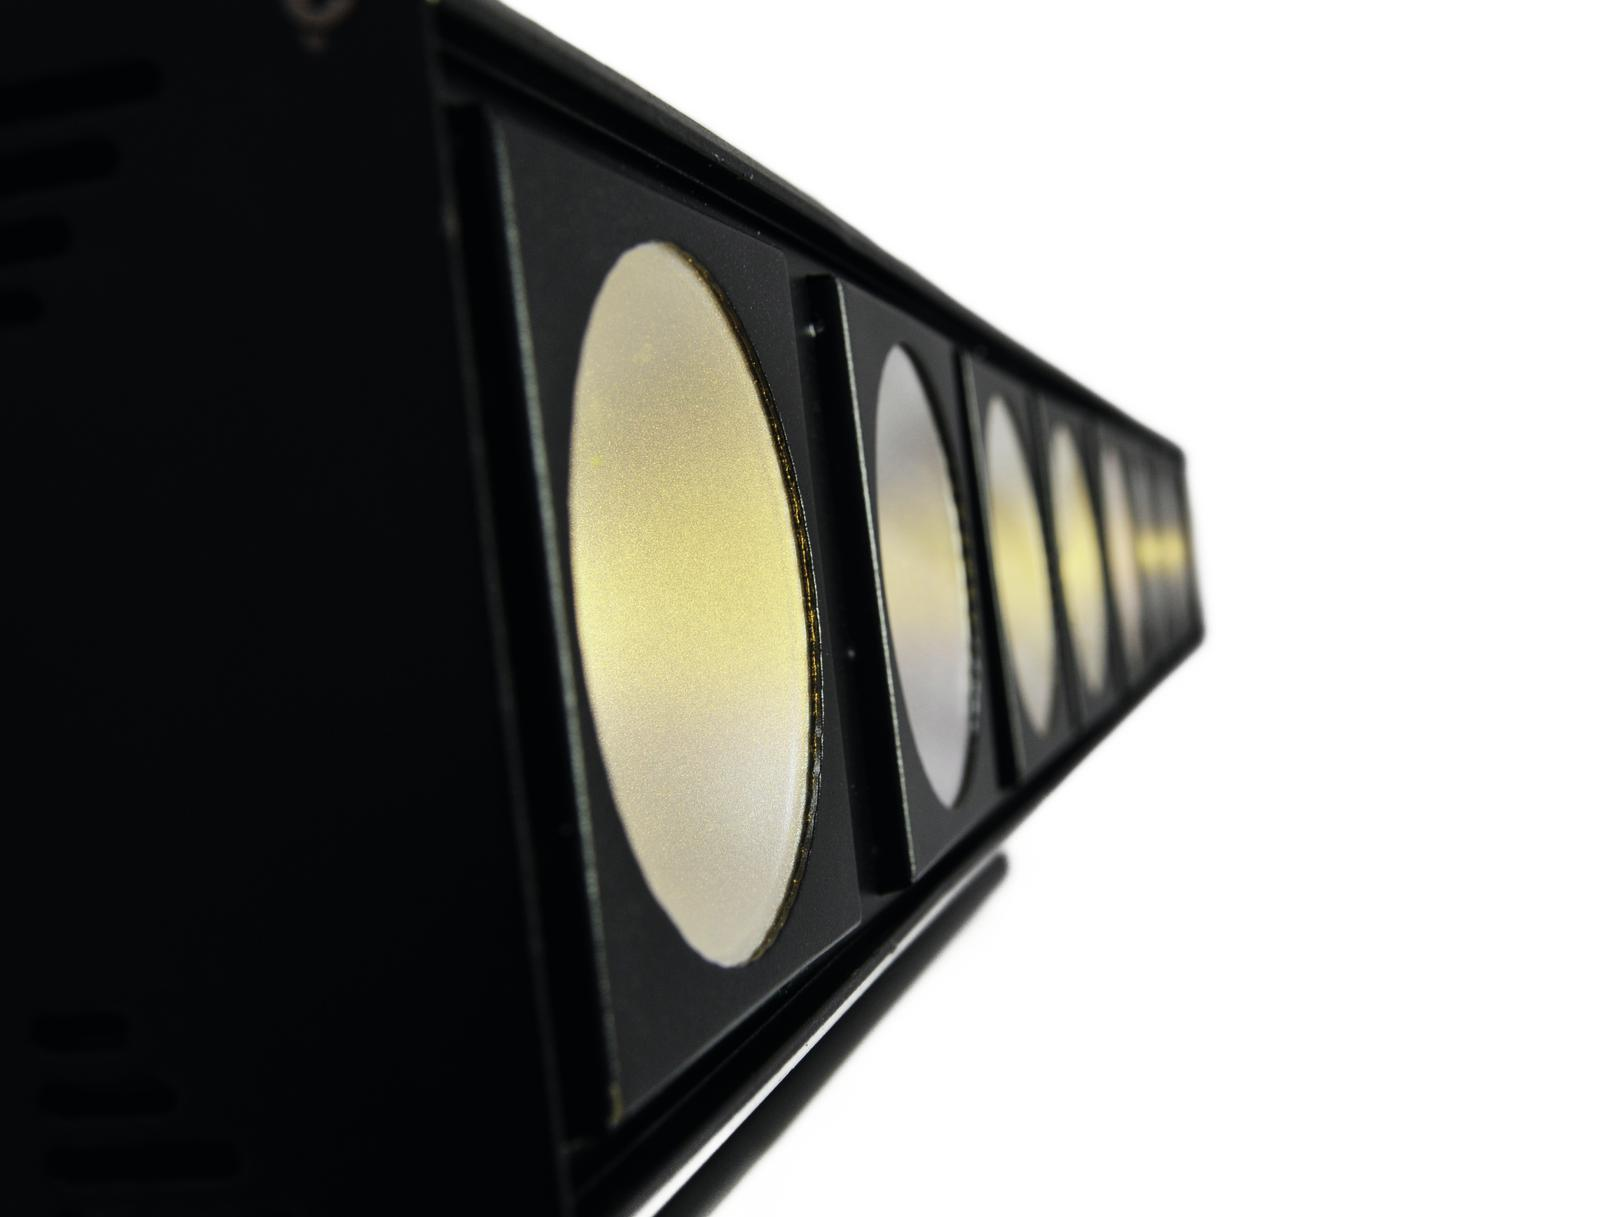 EUROLITE LED PMB-8 COB 3200K 30W Bar